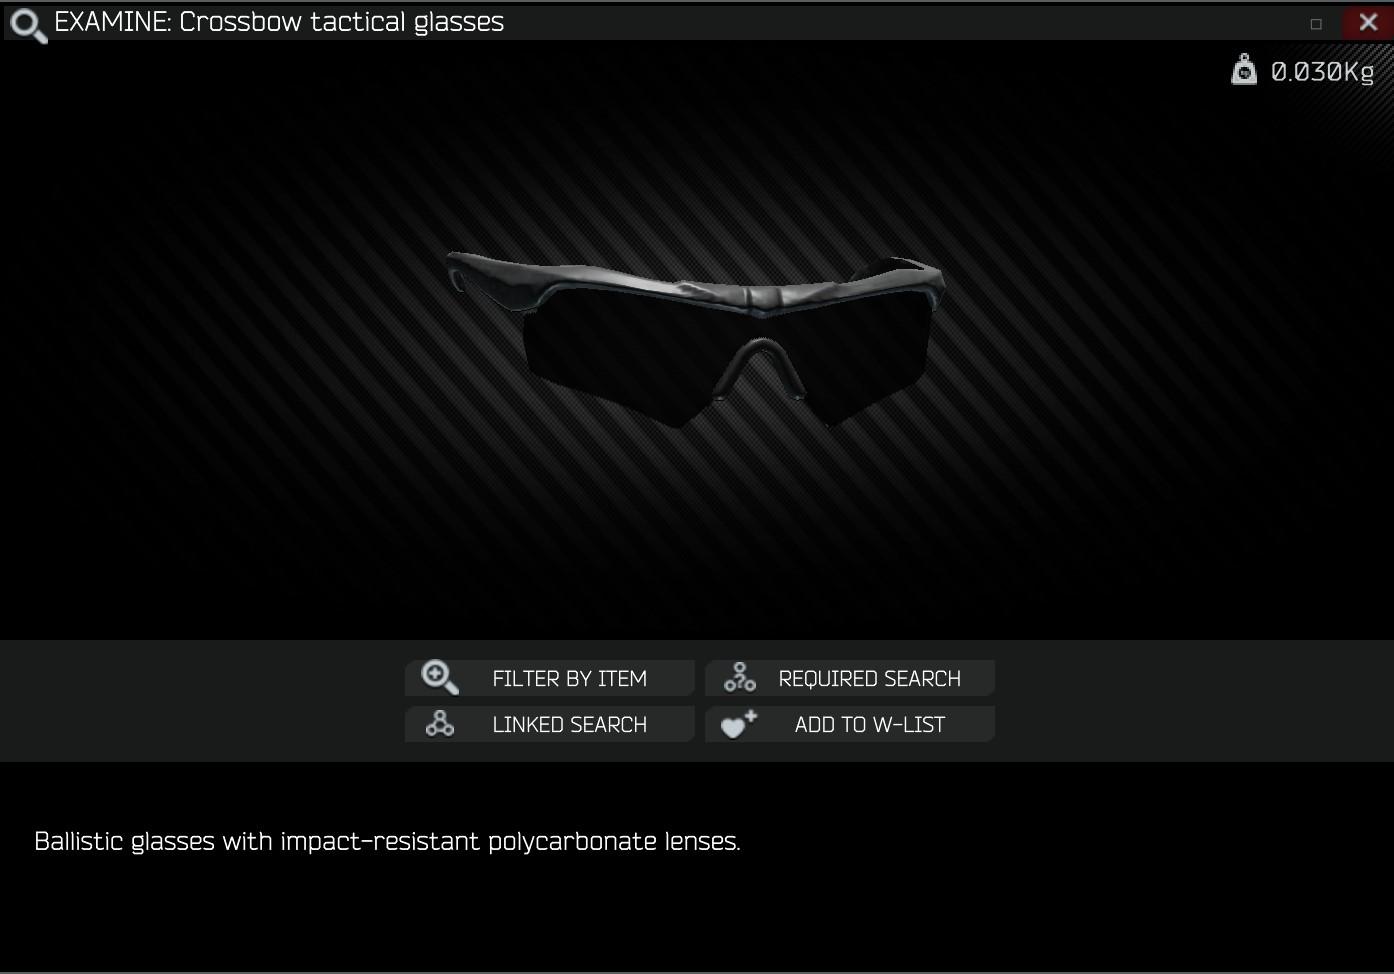 Crossbow tactical glasses.jpg